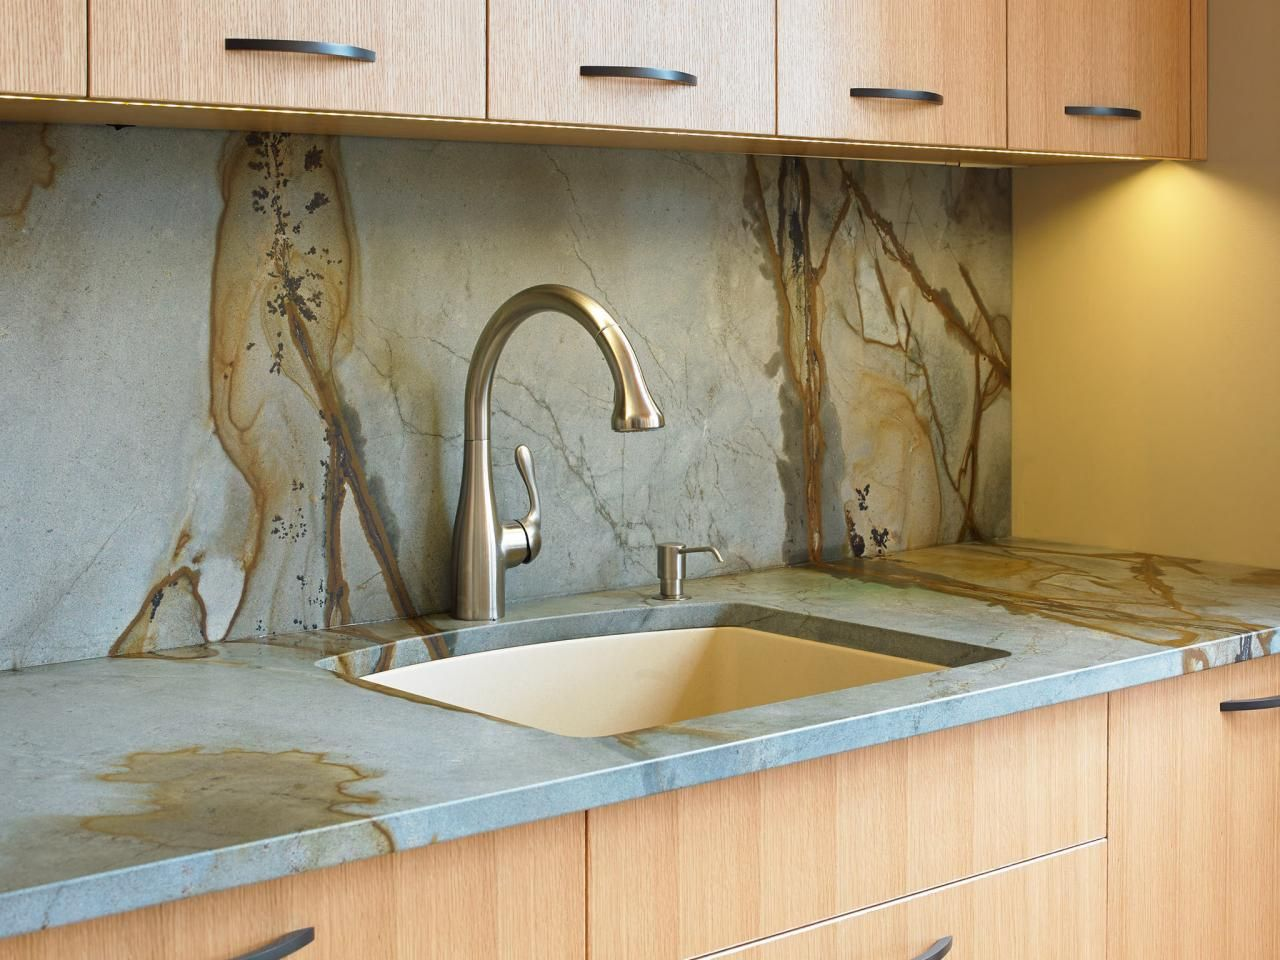 - 70+ Granite Countertops And Backsplash Ideas - Kitchen Cabinet Lig